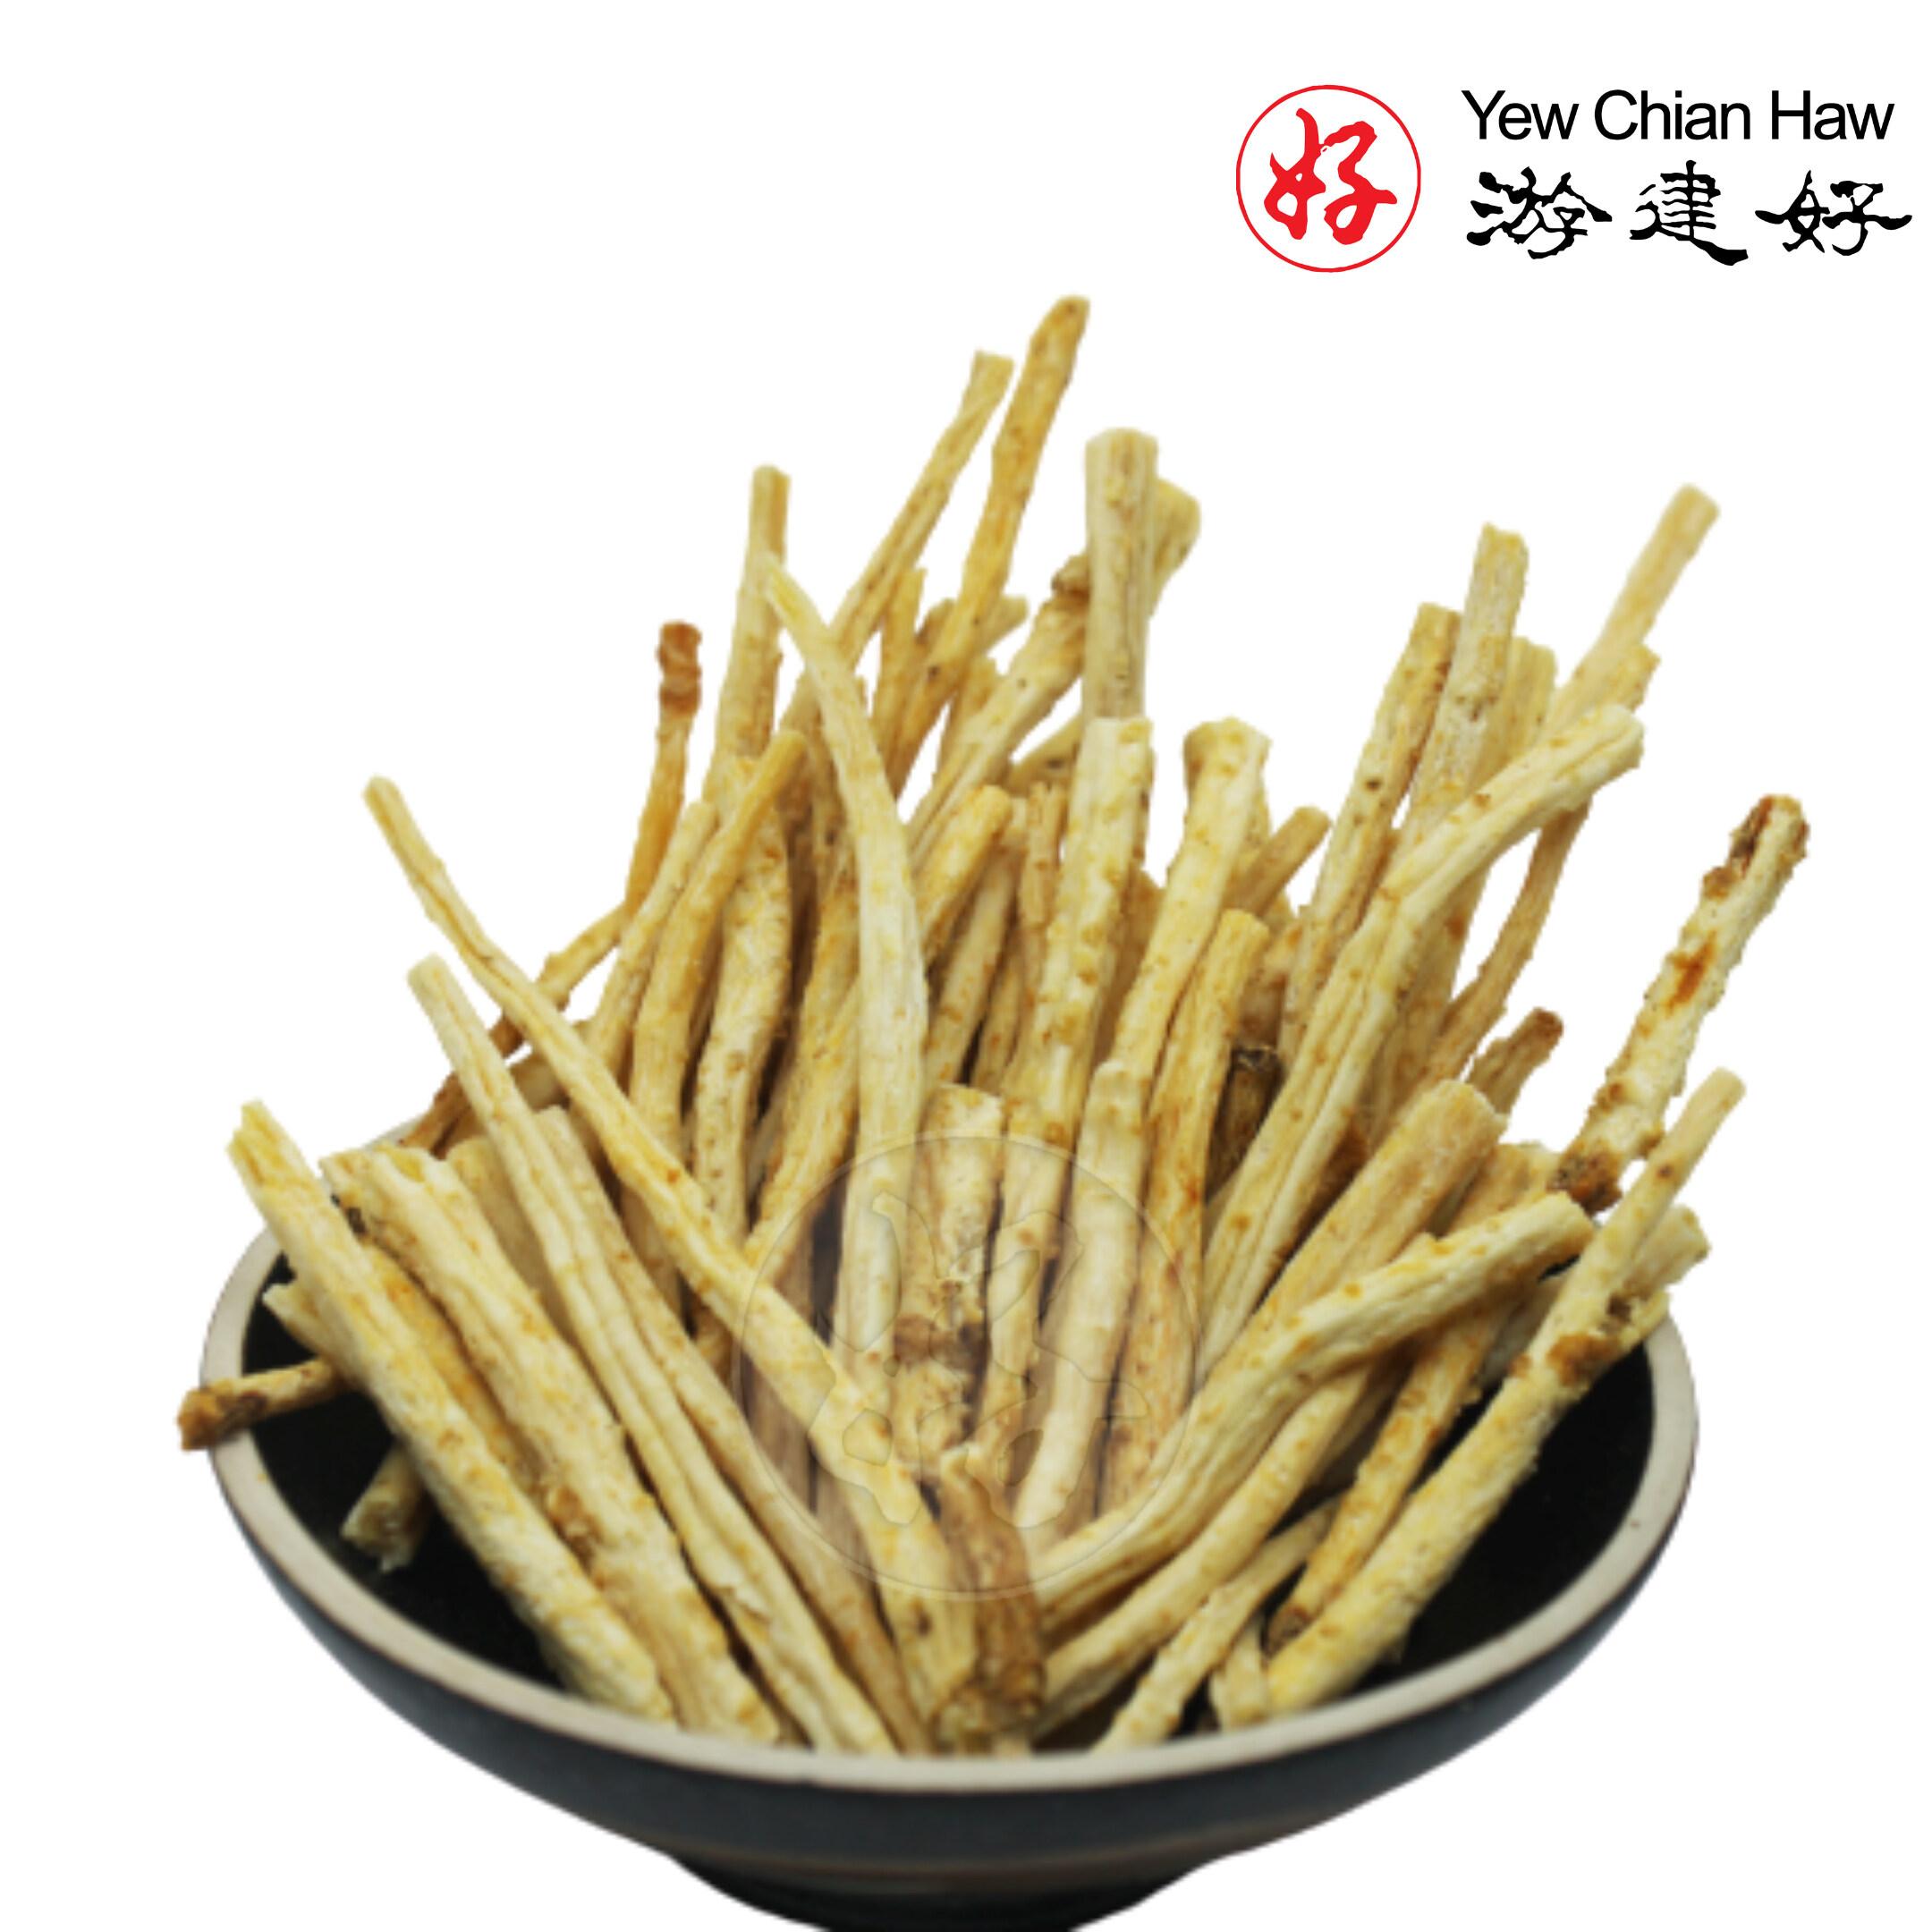 (90) YCH Herbs Glehniae / Sha Shen/ Adenophora Stricta (90g Pack)HALAL